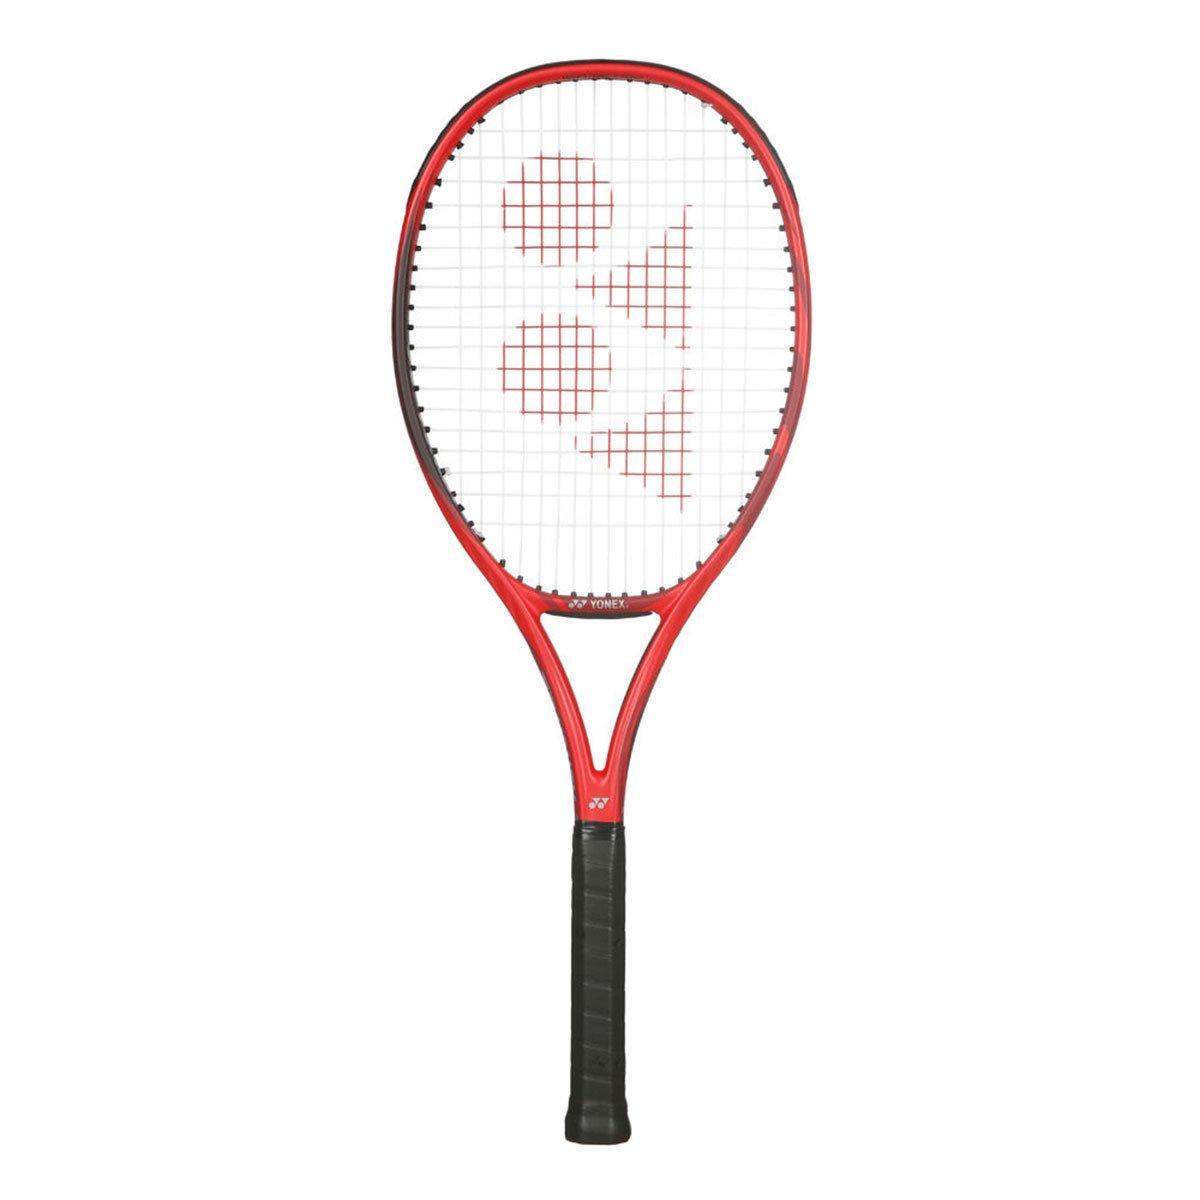 Yonex Tennis Racket >> Yonex Vcore Feel Tennis Racquet Strung